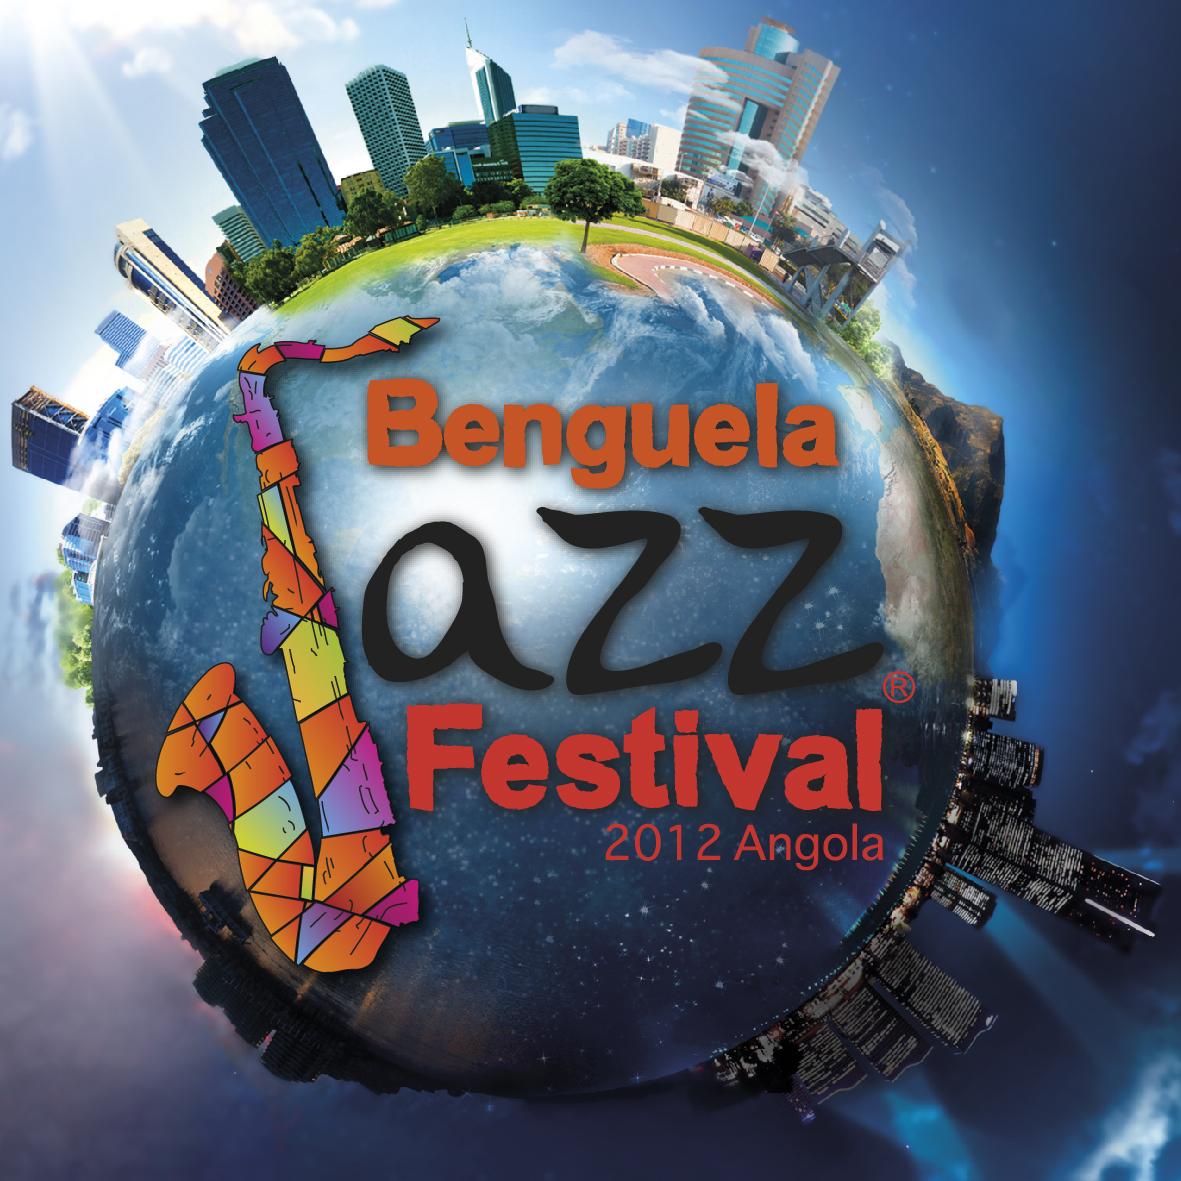 Benguela Jazz Festival